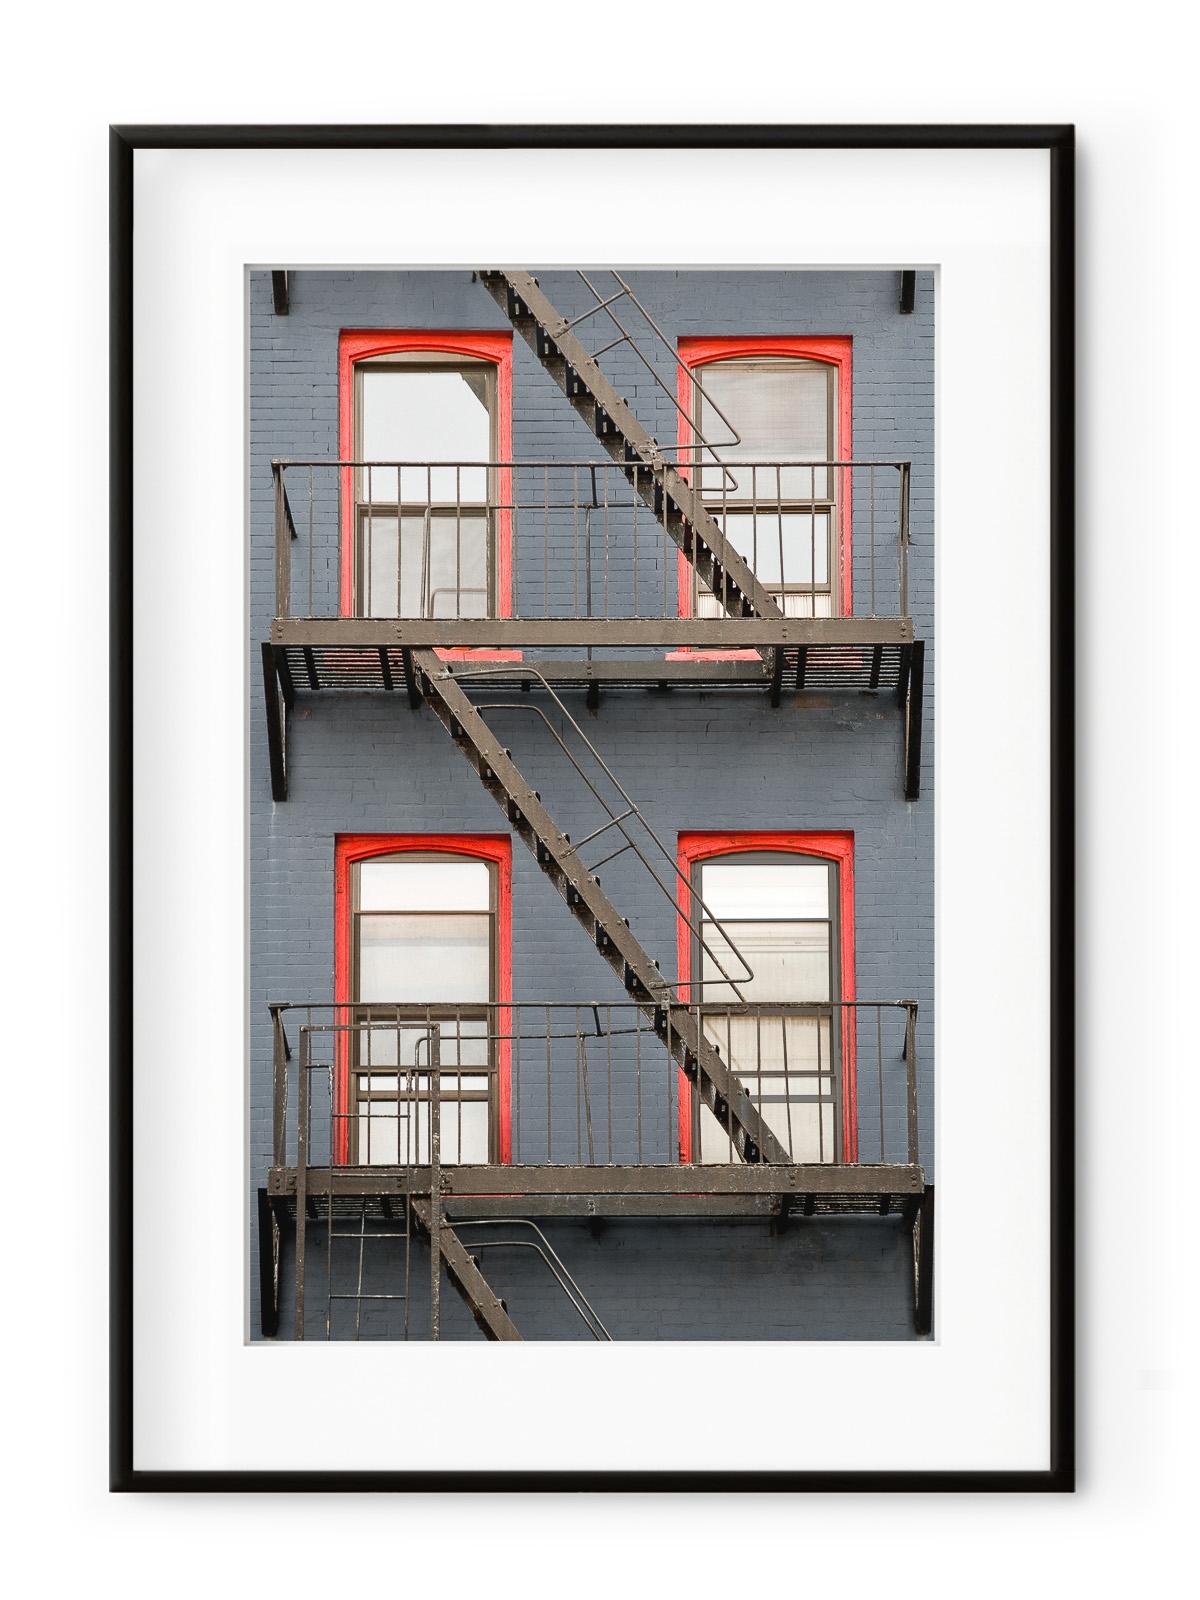 Tablou Façade de Briques New York Aluminium Noir title=Tablou Façade de Briques New York Aluminium Noir